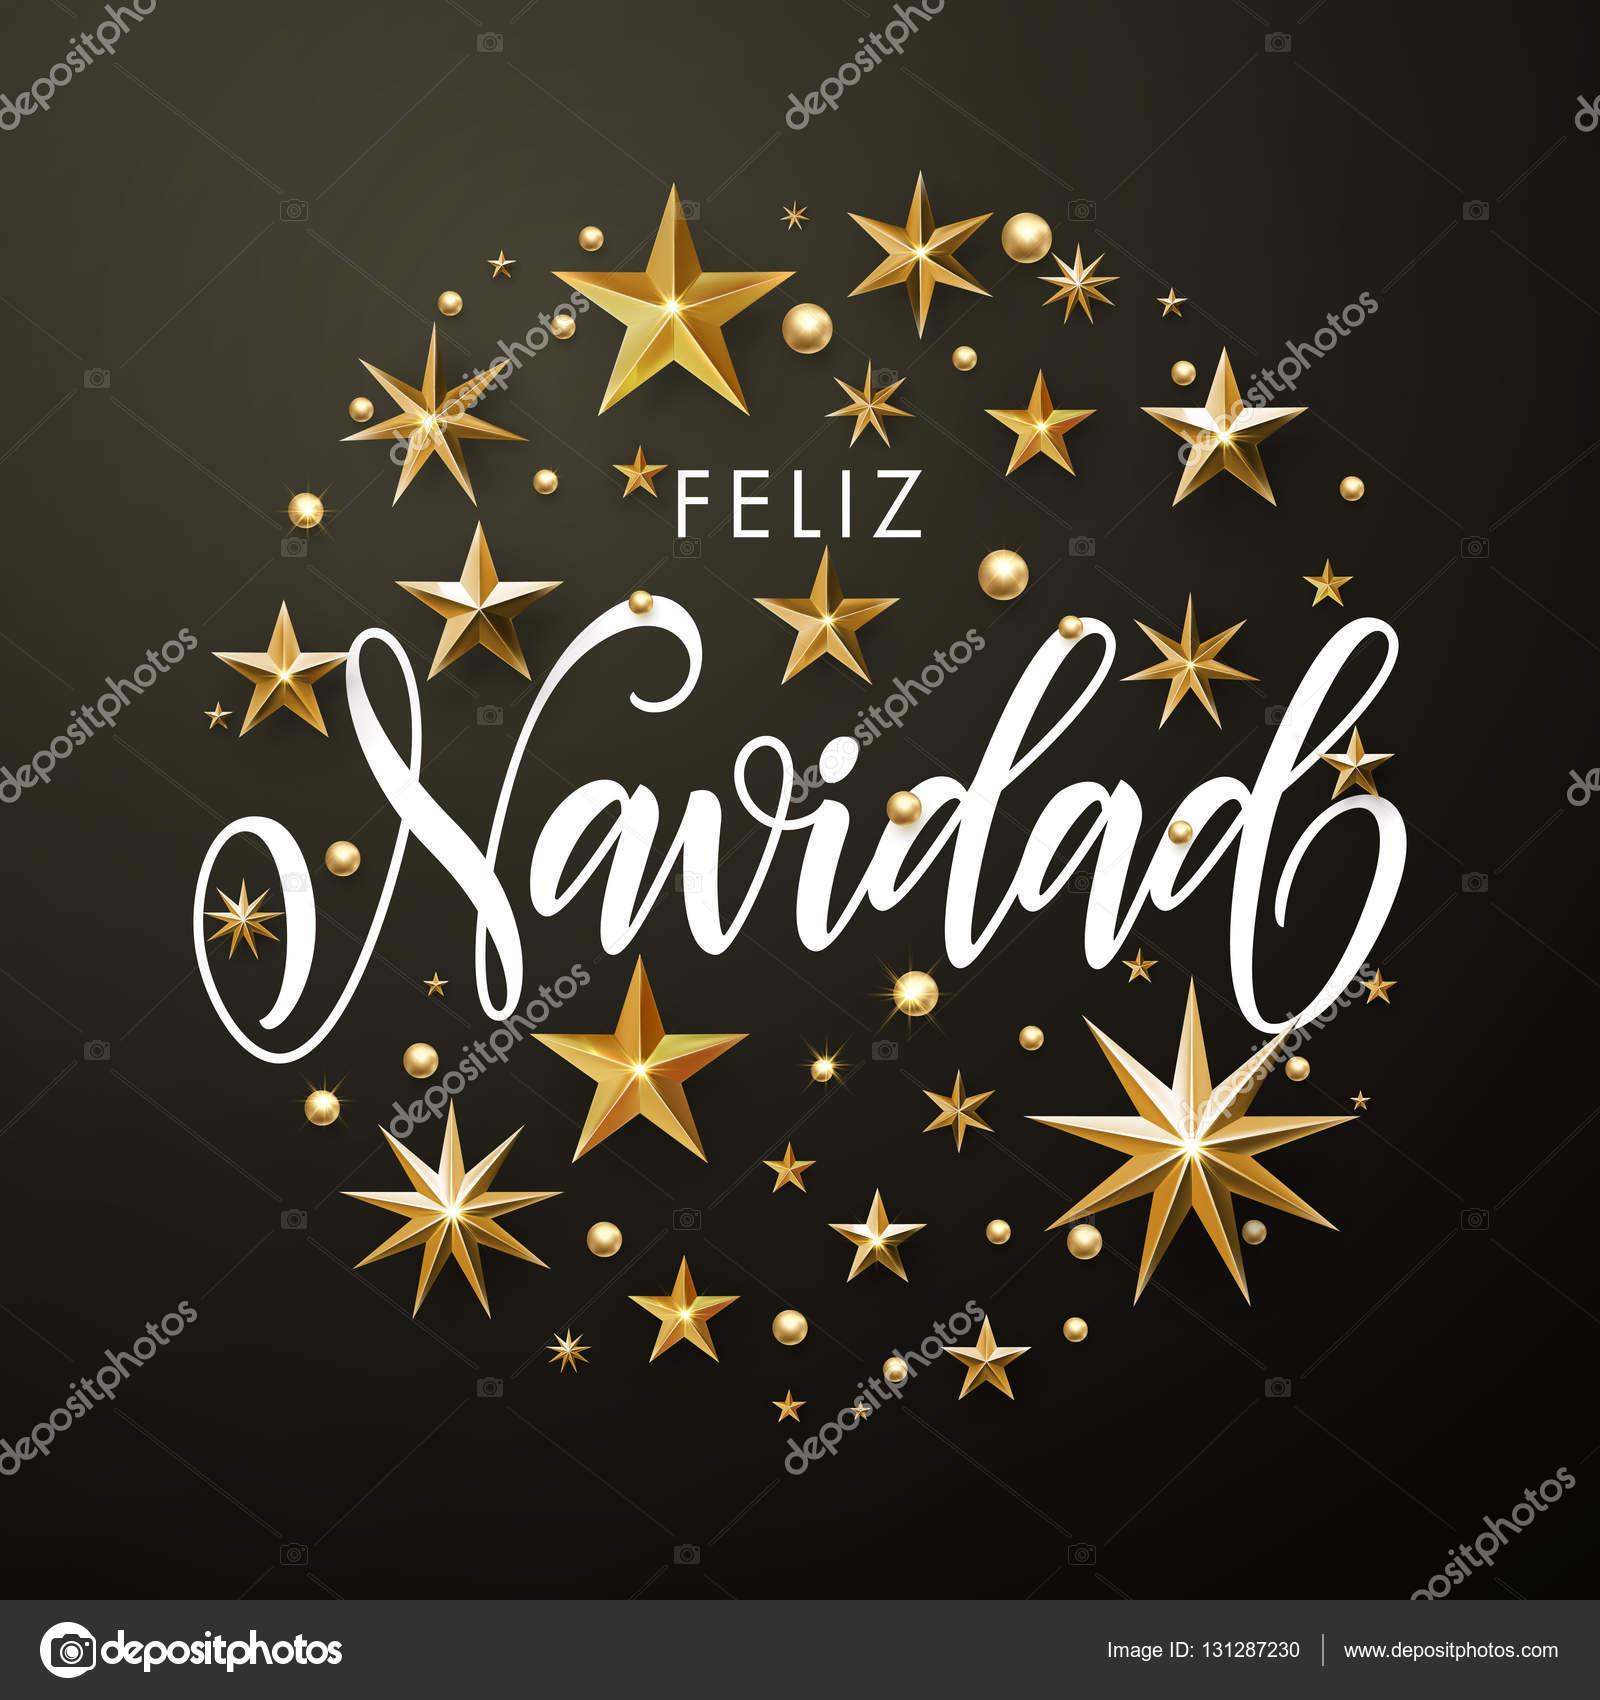 Spanish Merry Christmas Feliz Navidad gold glitter stars greeting ...